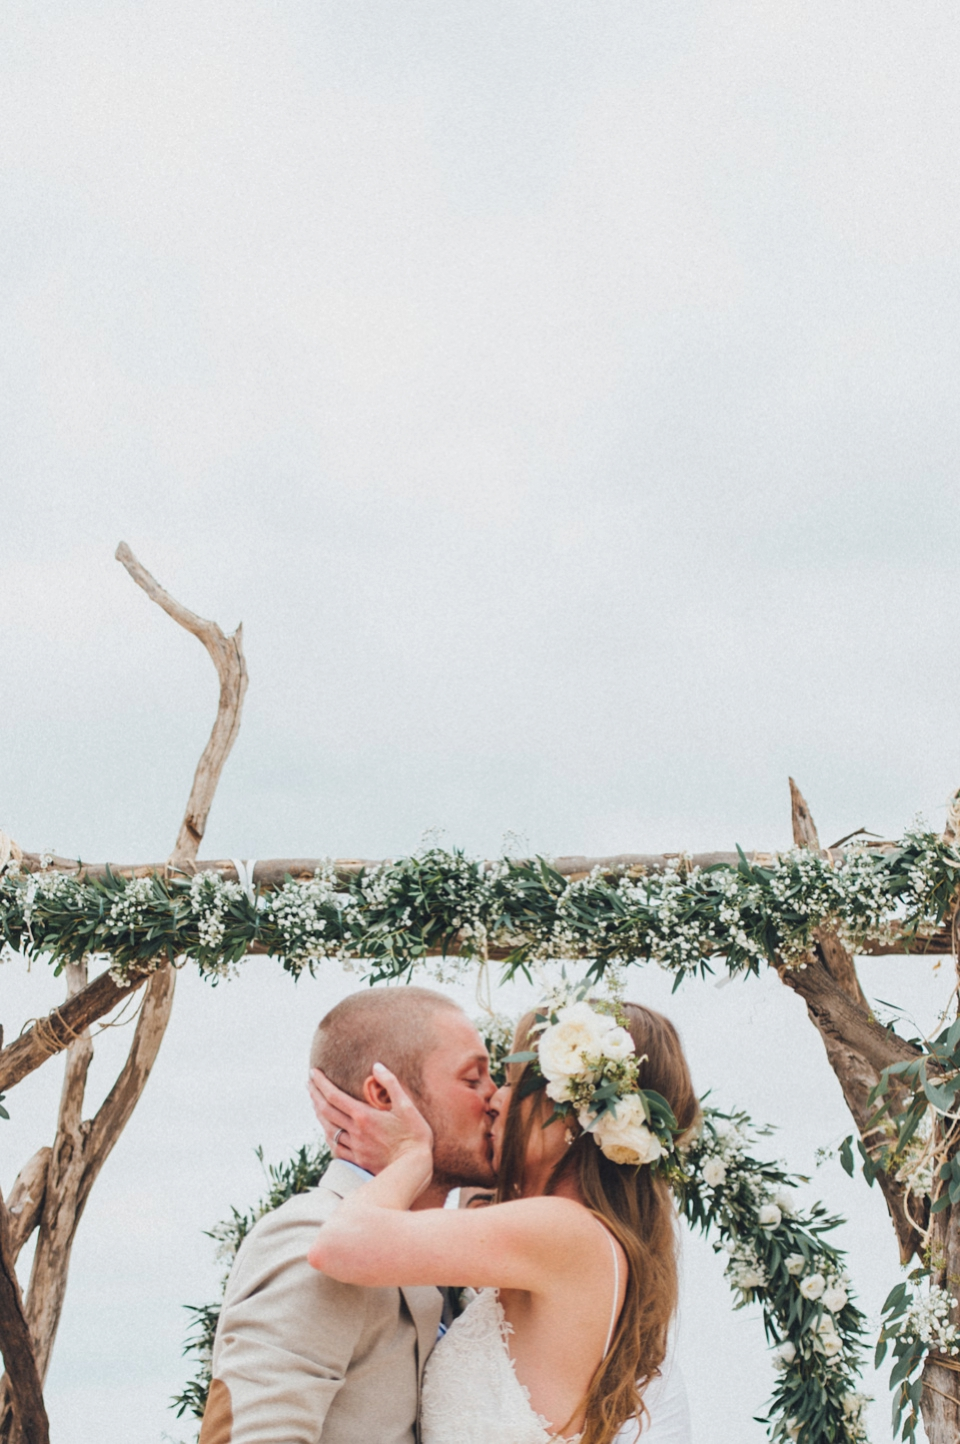 bohemian-ibiza-kreativ-wedding_0082 hochzeitsfotograf hochzeitsvideo ibiza bohemian weddingSaskia & Pierre Bohemian Bohemian Ibiza Weddingbohemian ibiza kreativ wedding 0082